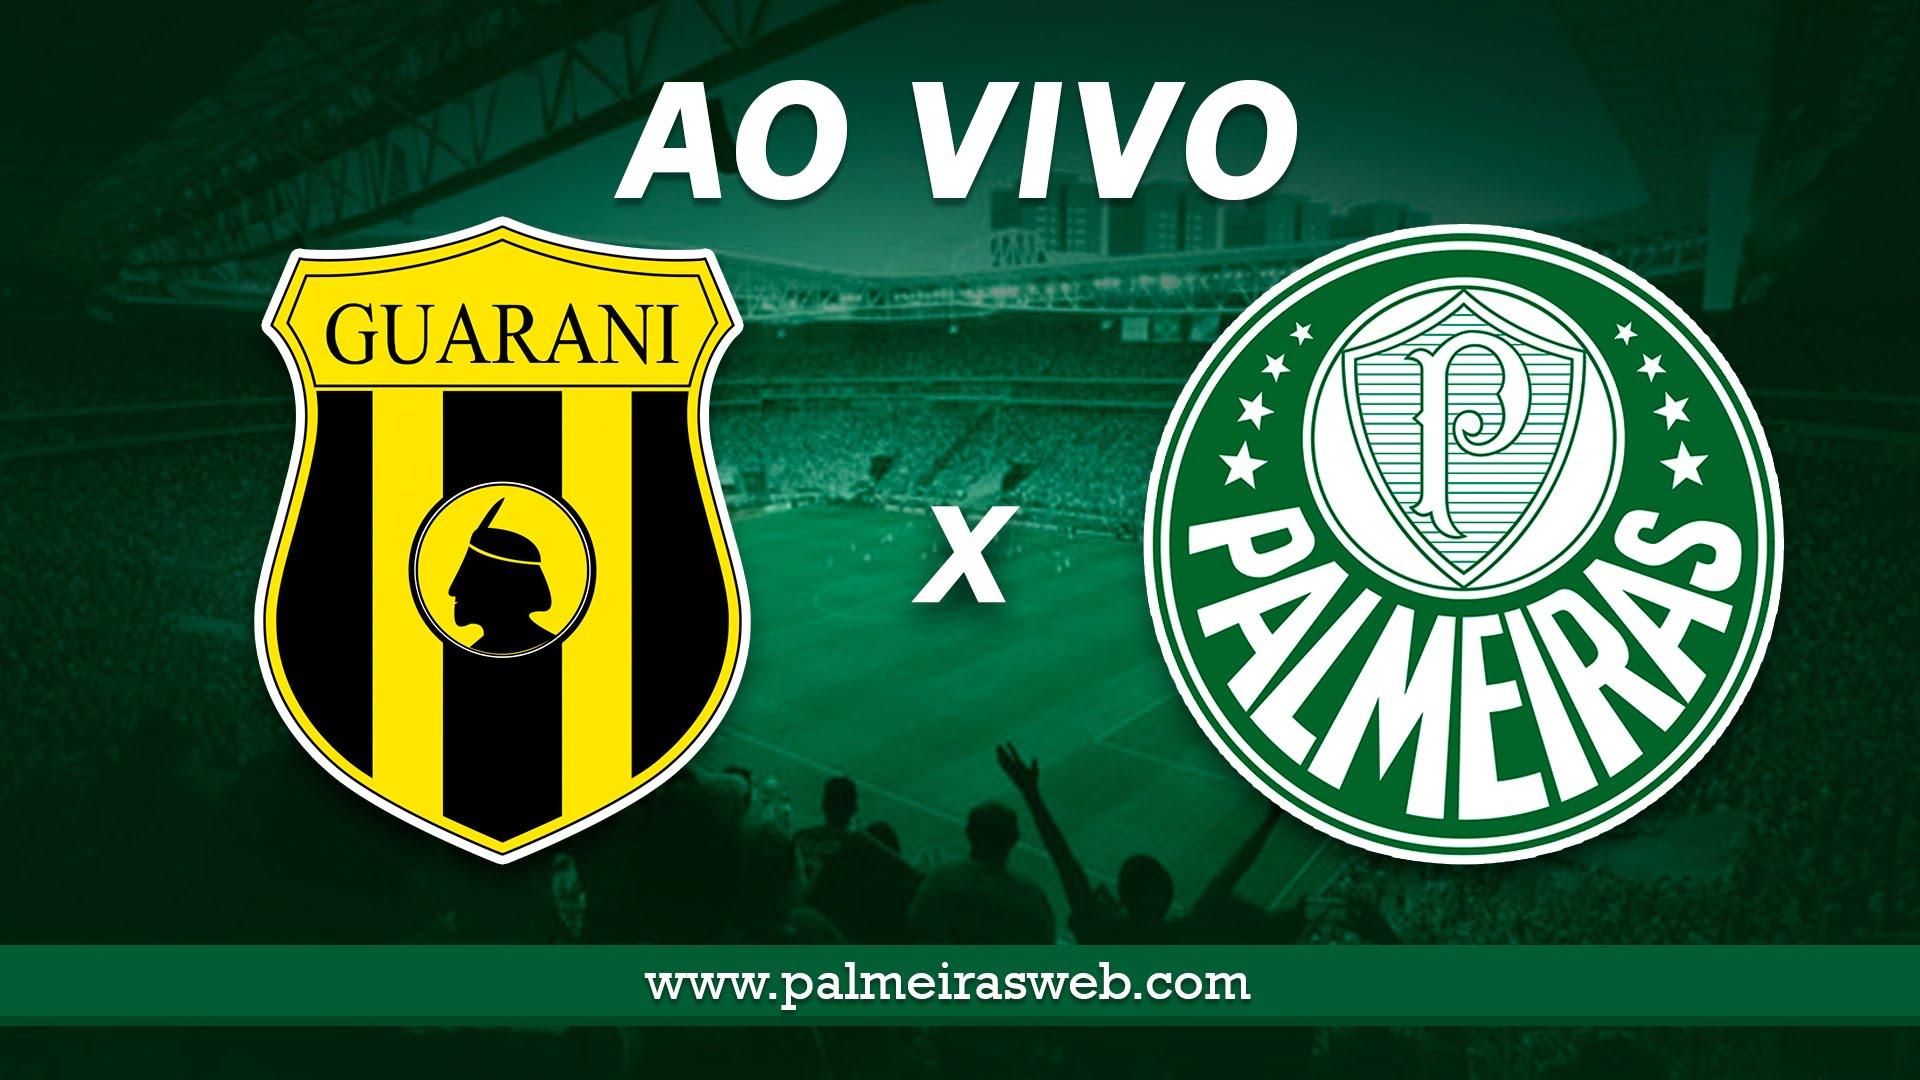 Guaraní-PAR x Palmeiras Ao Vivo